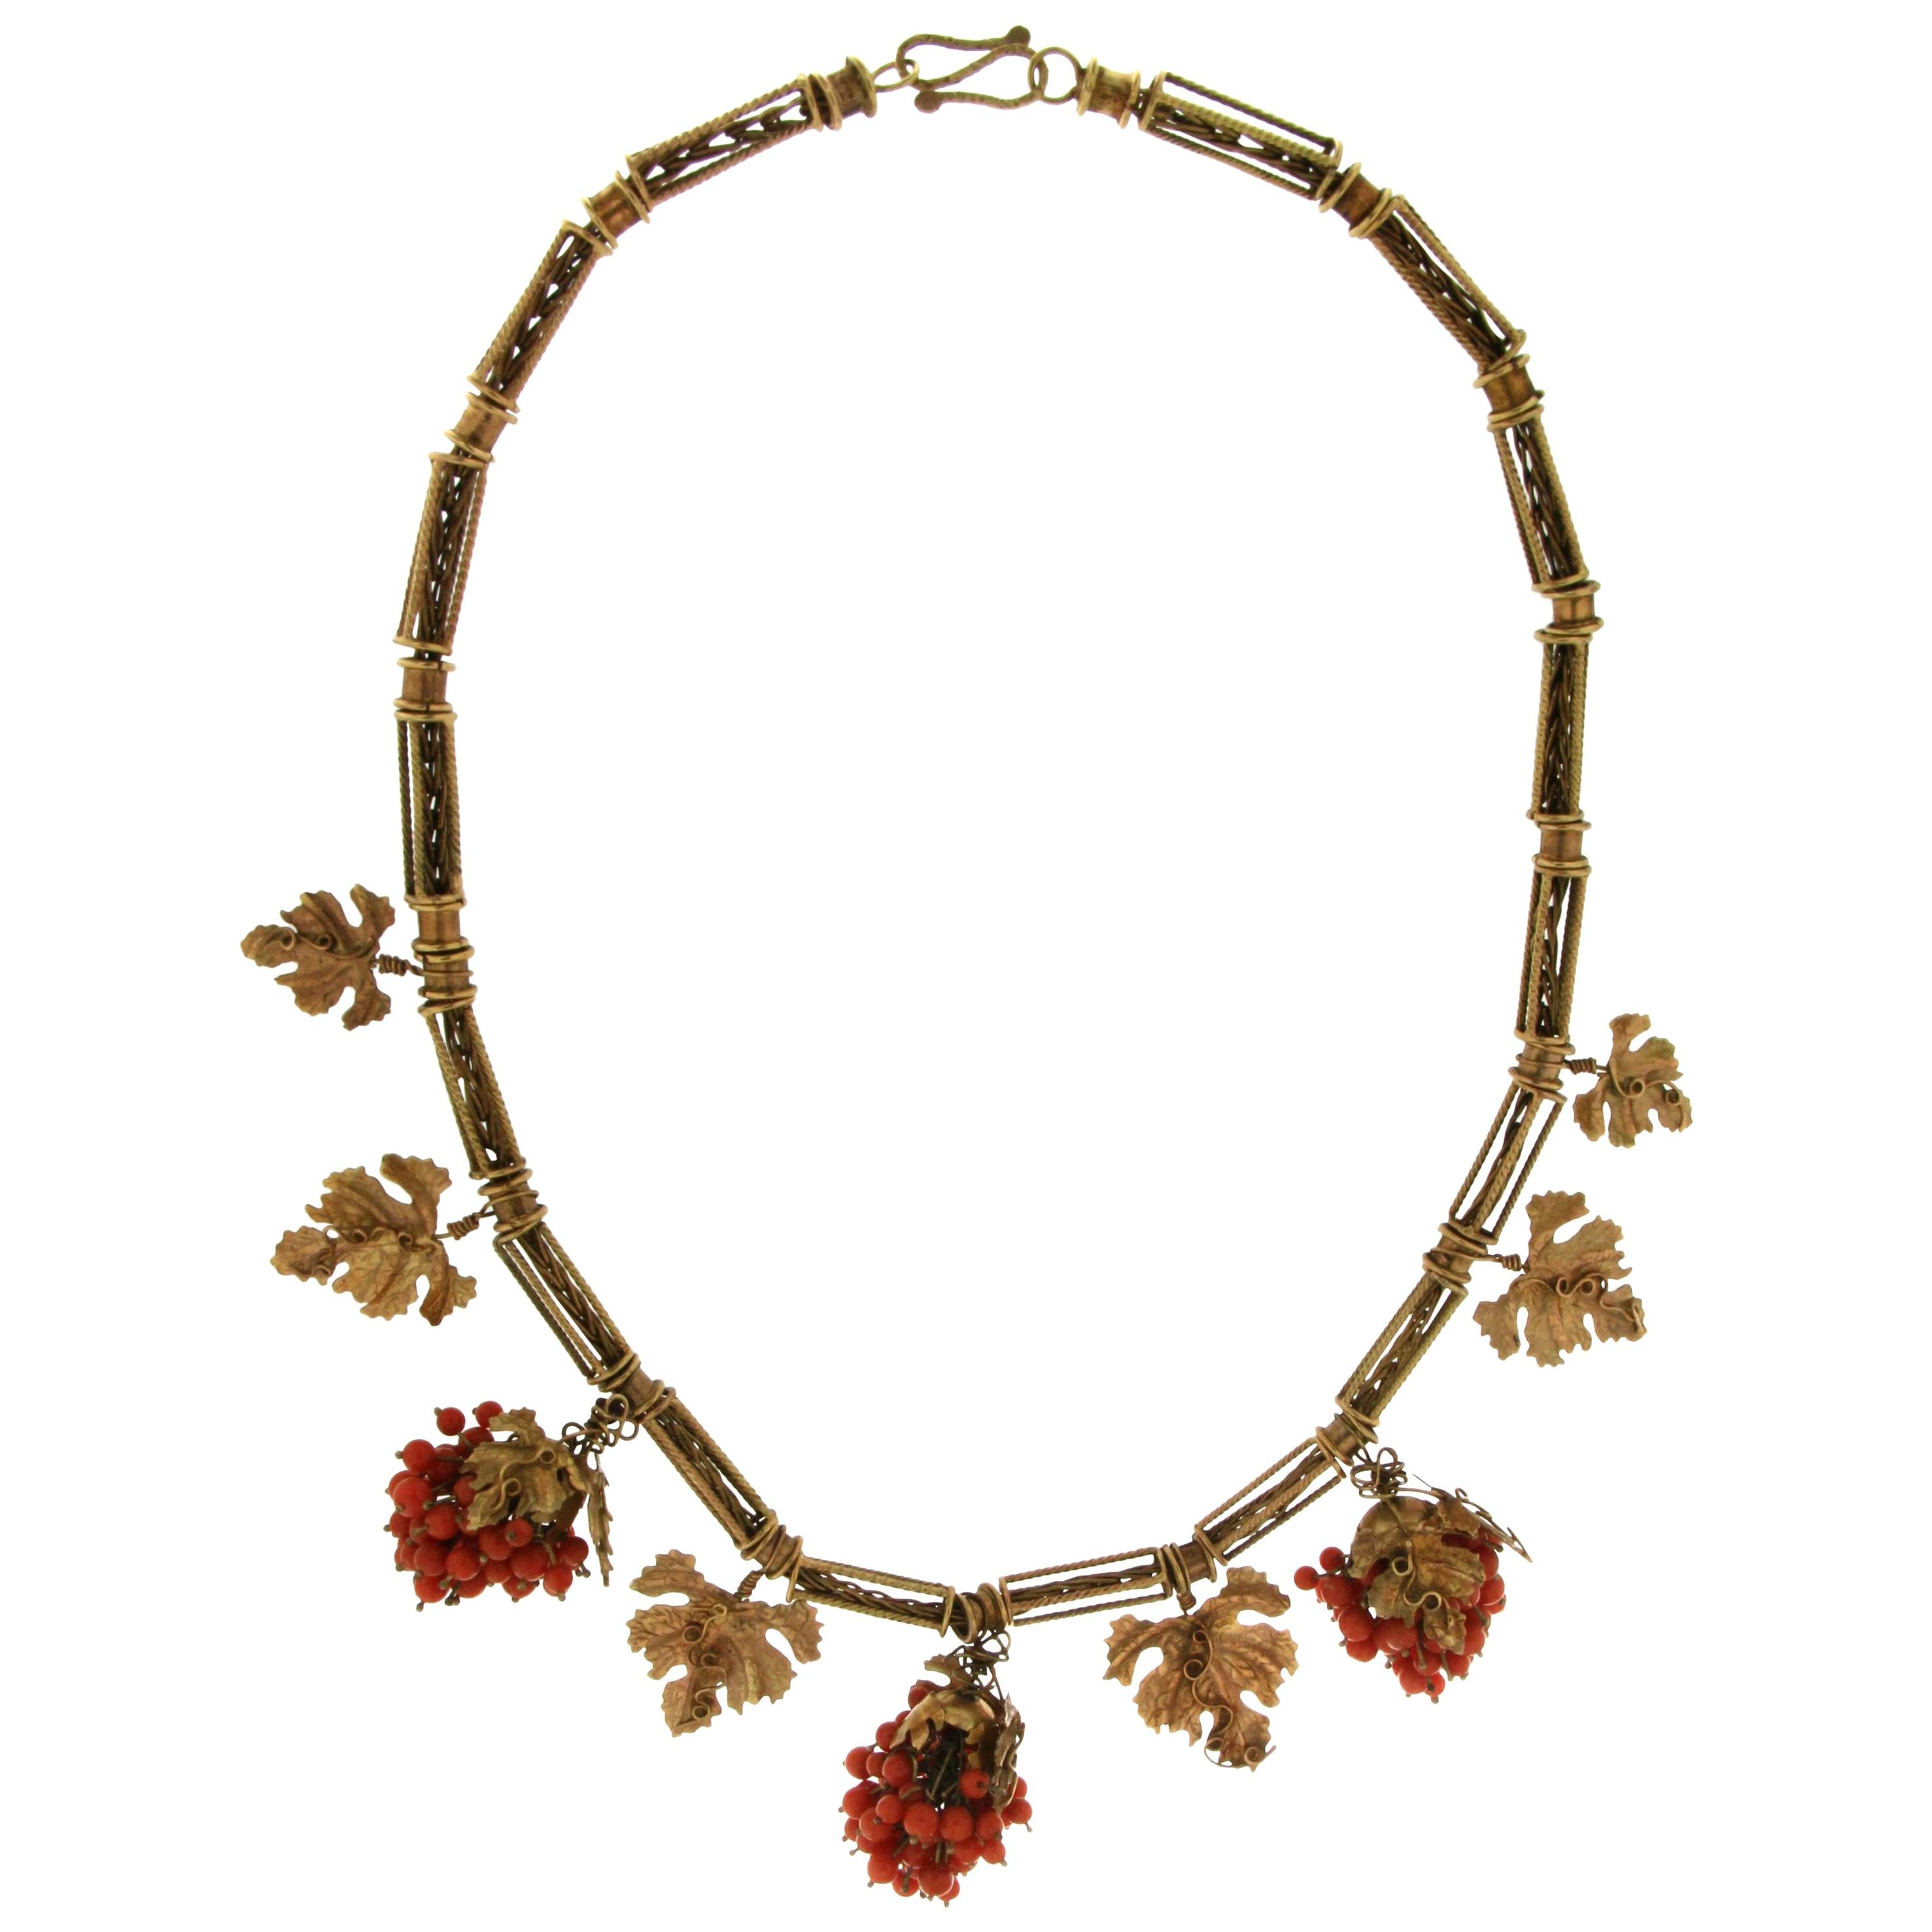 Handcraft 9 Karat Yellow Gold Coral Choker Necklace